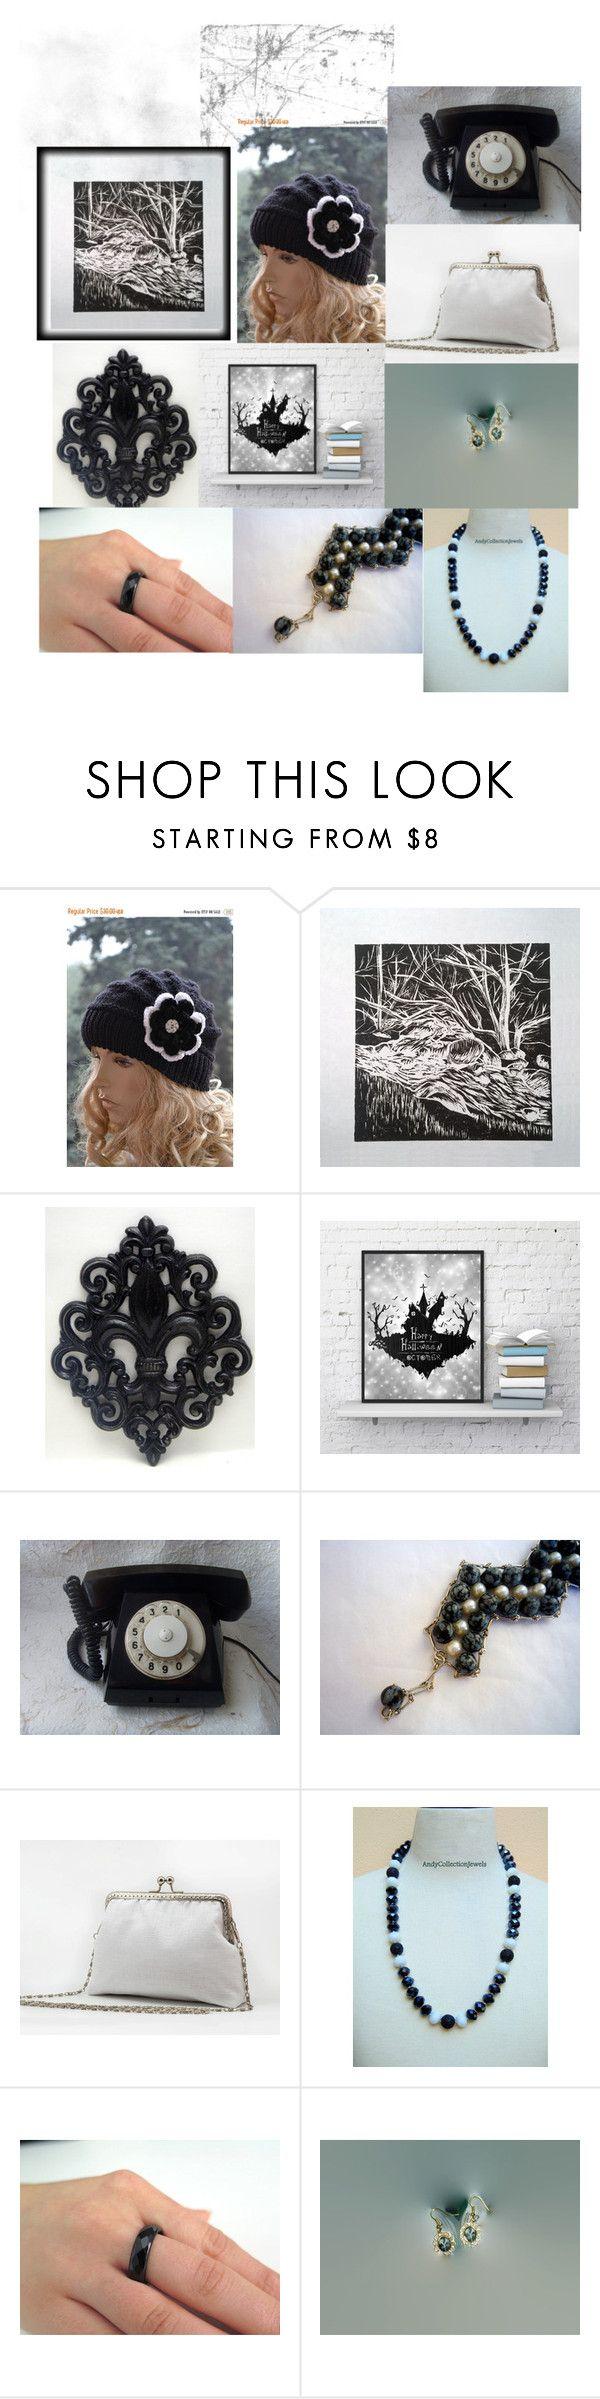 Black and white by viyoli on Polyvore